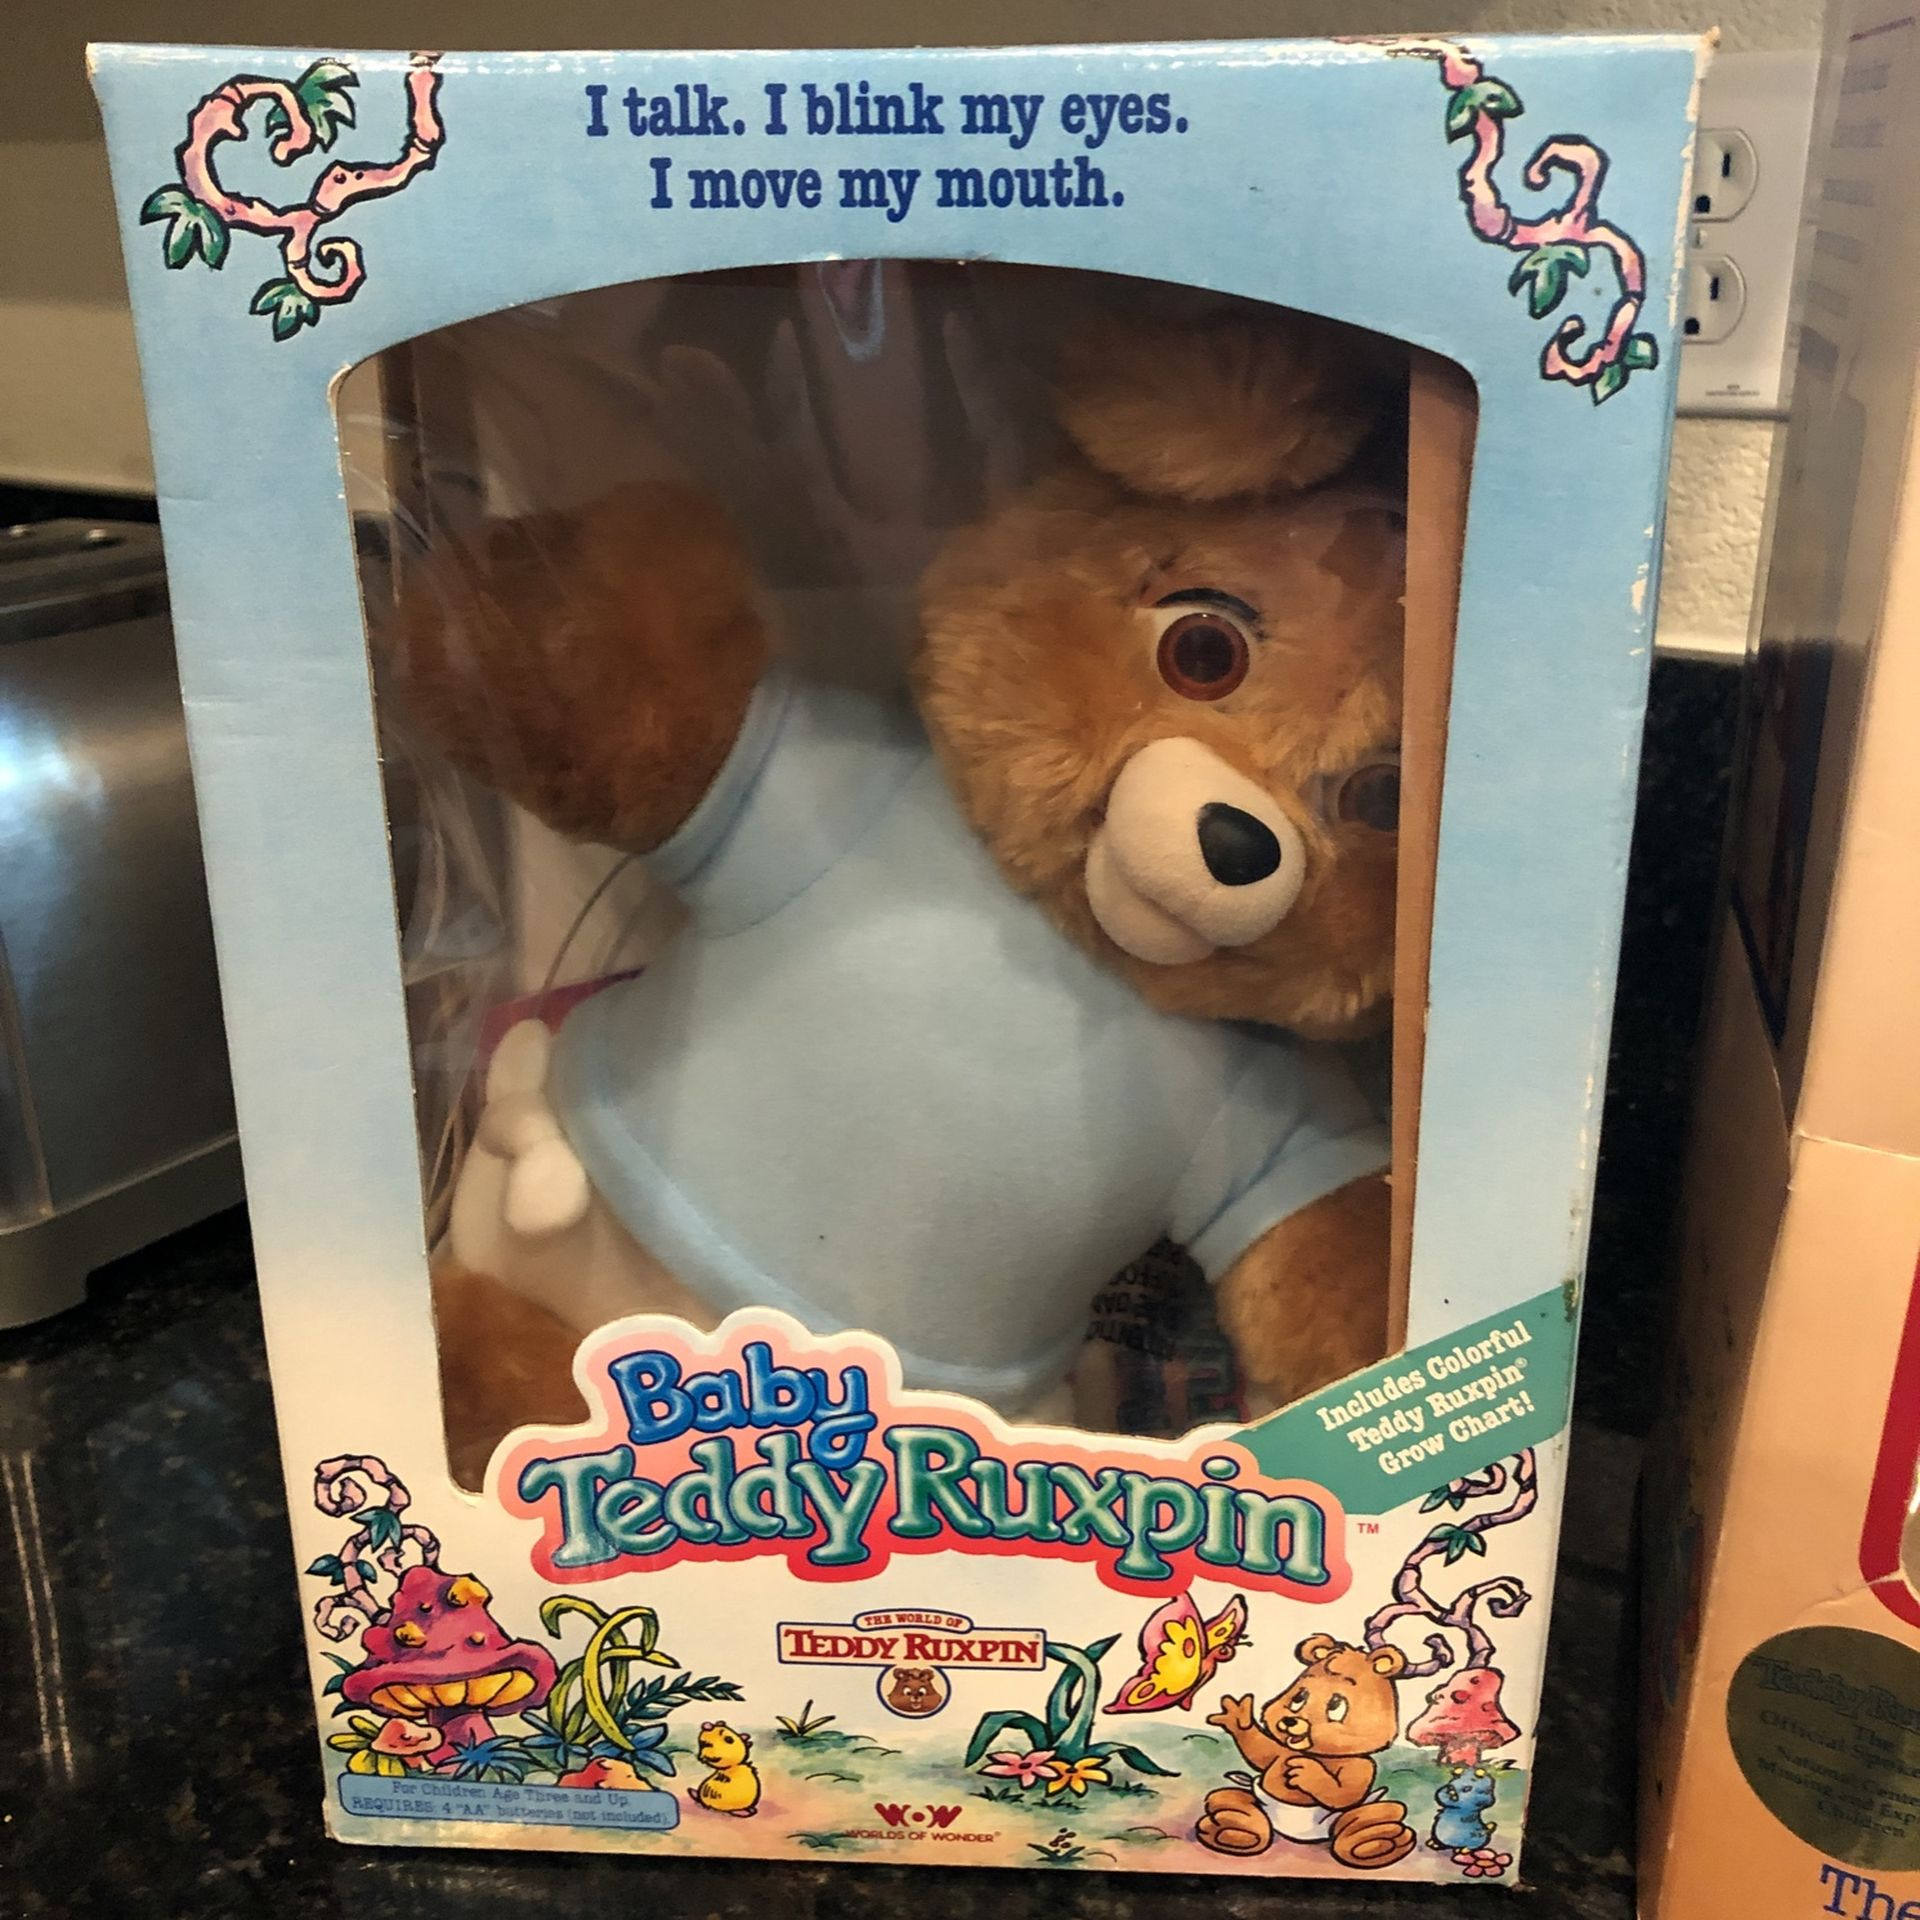 Teddy Ruxpin, Baby Teddy Ruxpin